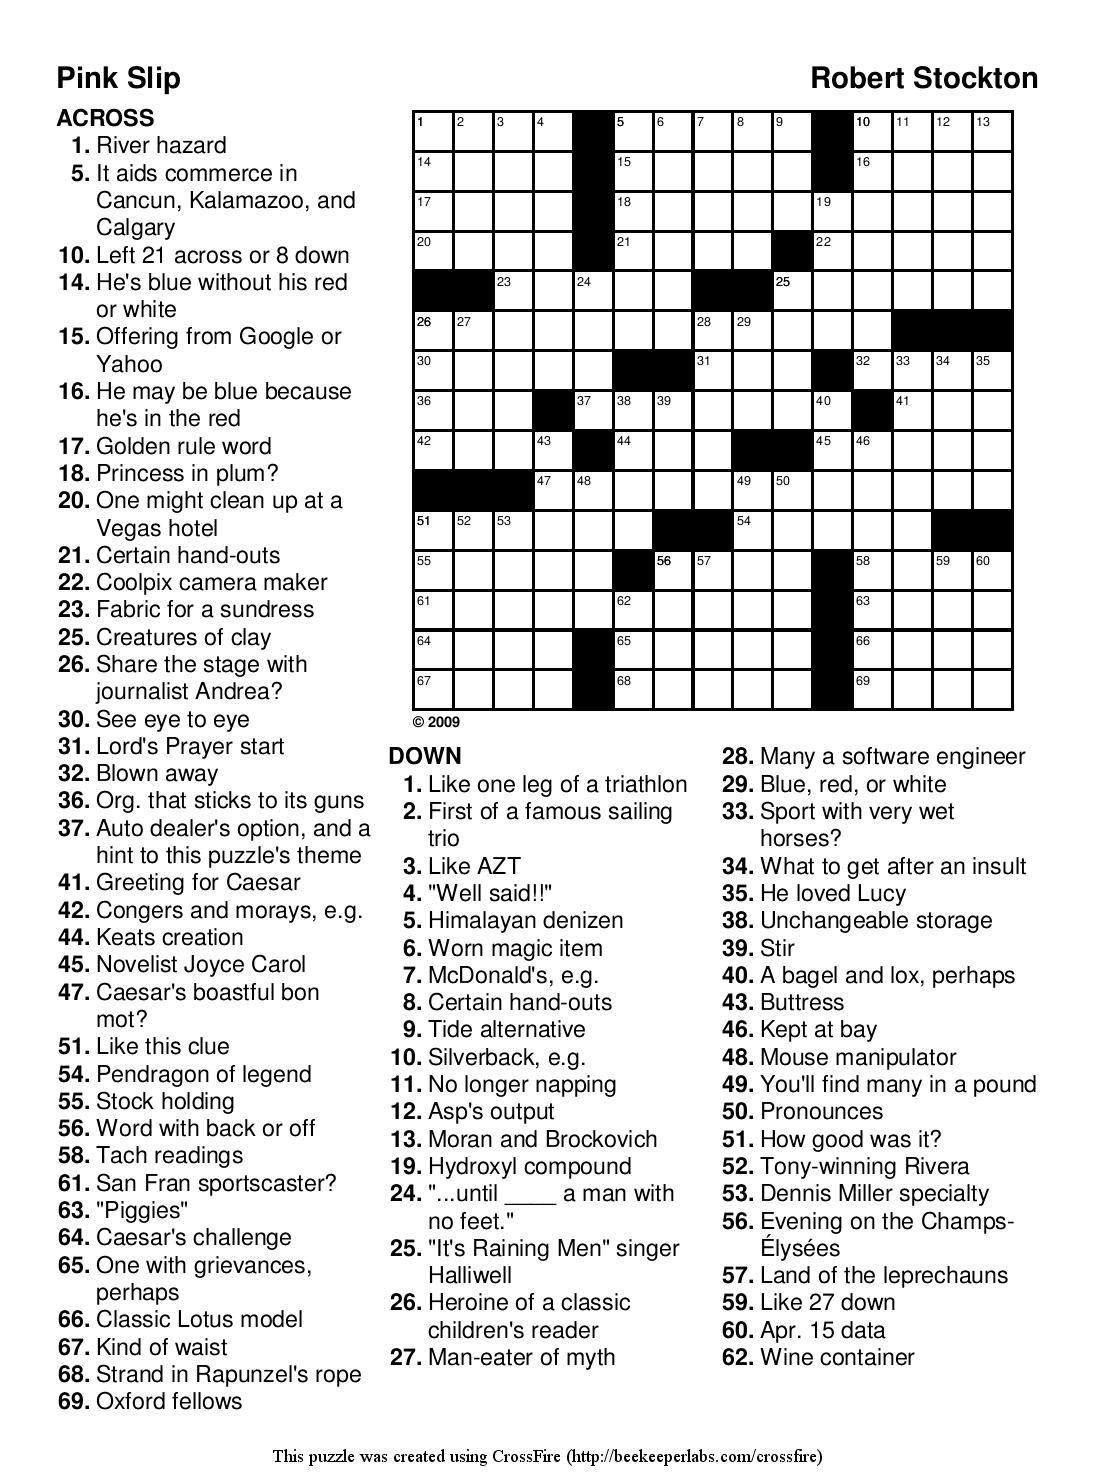 Free Printable Sports Crossword Puzzles | Free Printables - Printable Crossword Puzzles About Sports